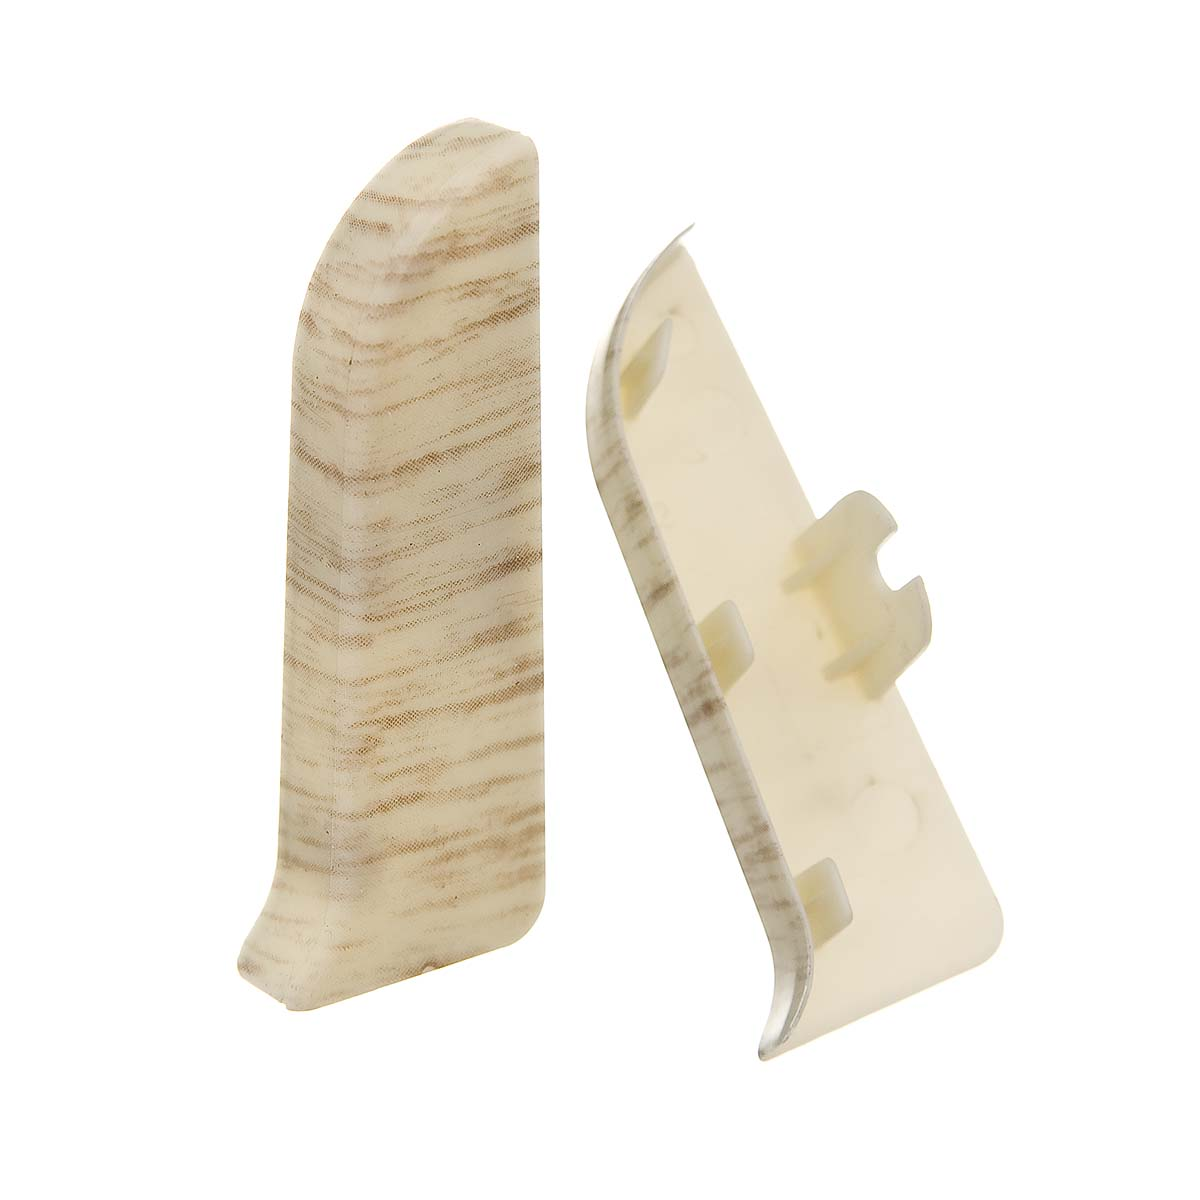 Заглушки торцевые (левая+правая) к плинтусу 68 мм клен Nexus